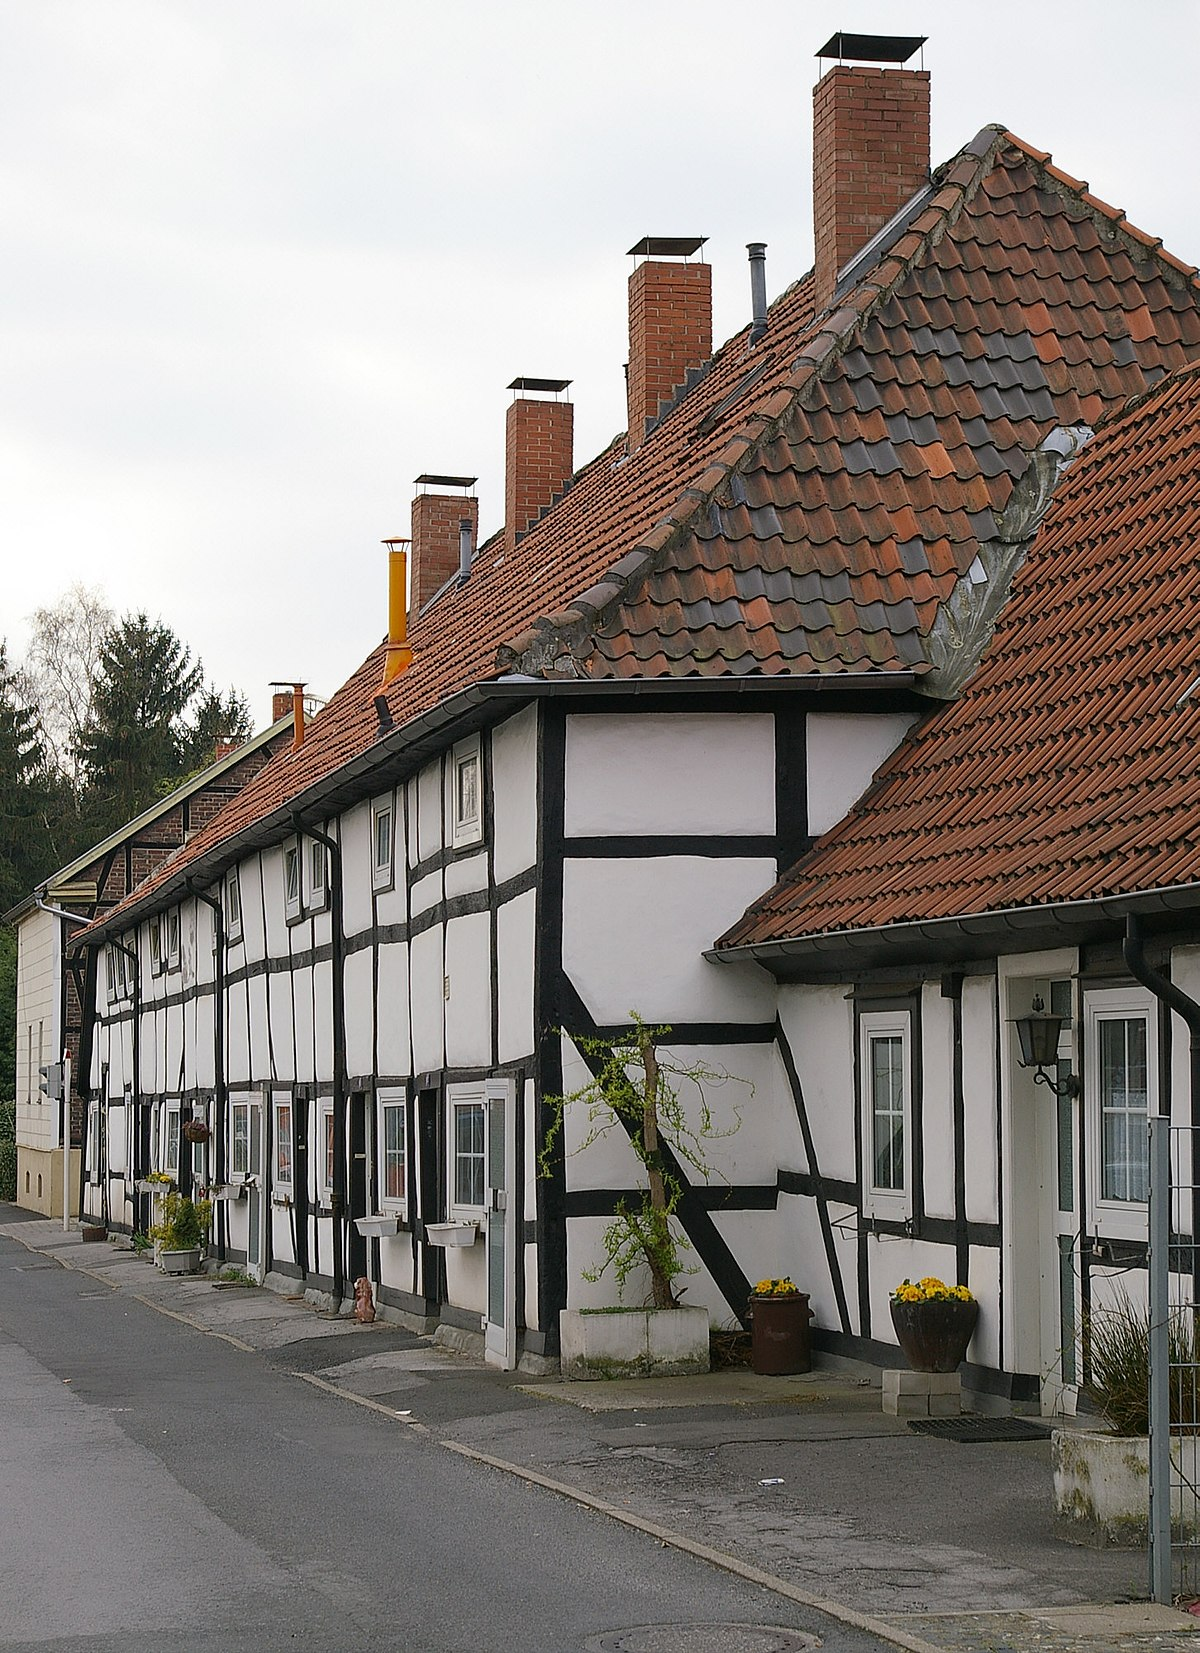 Gaden  Wikipedia